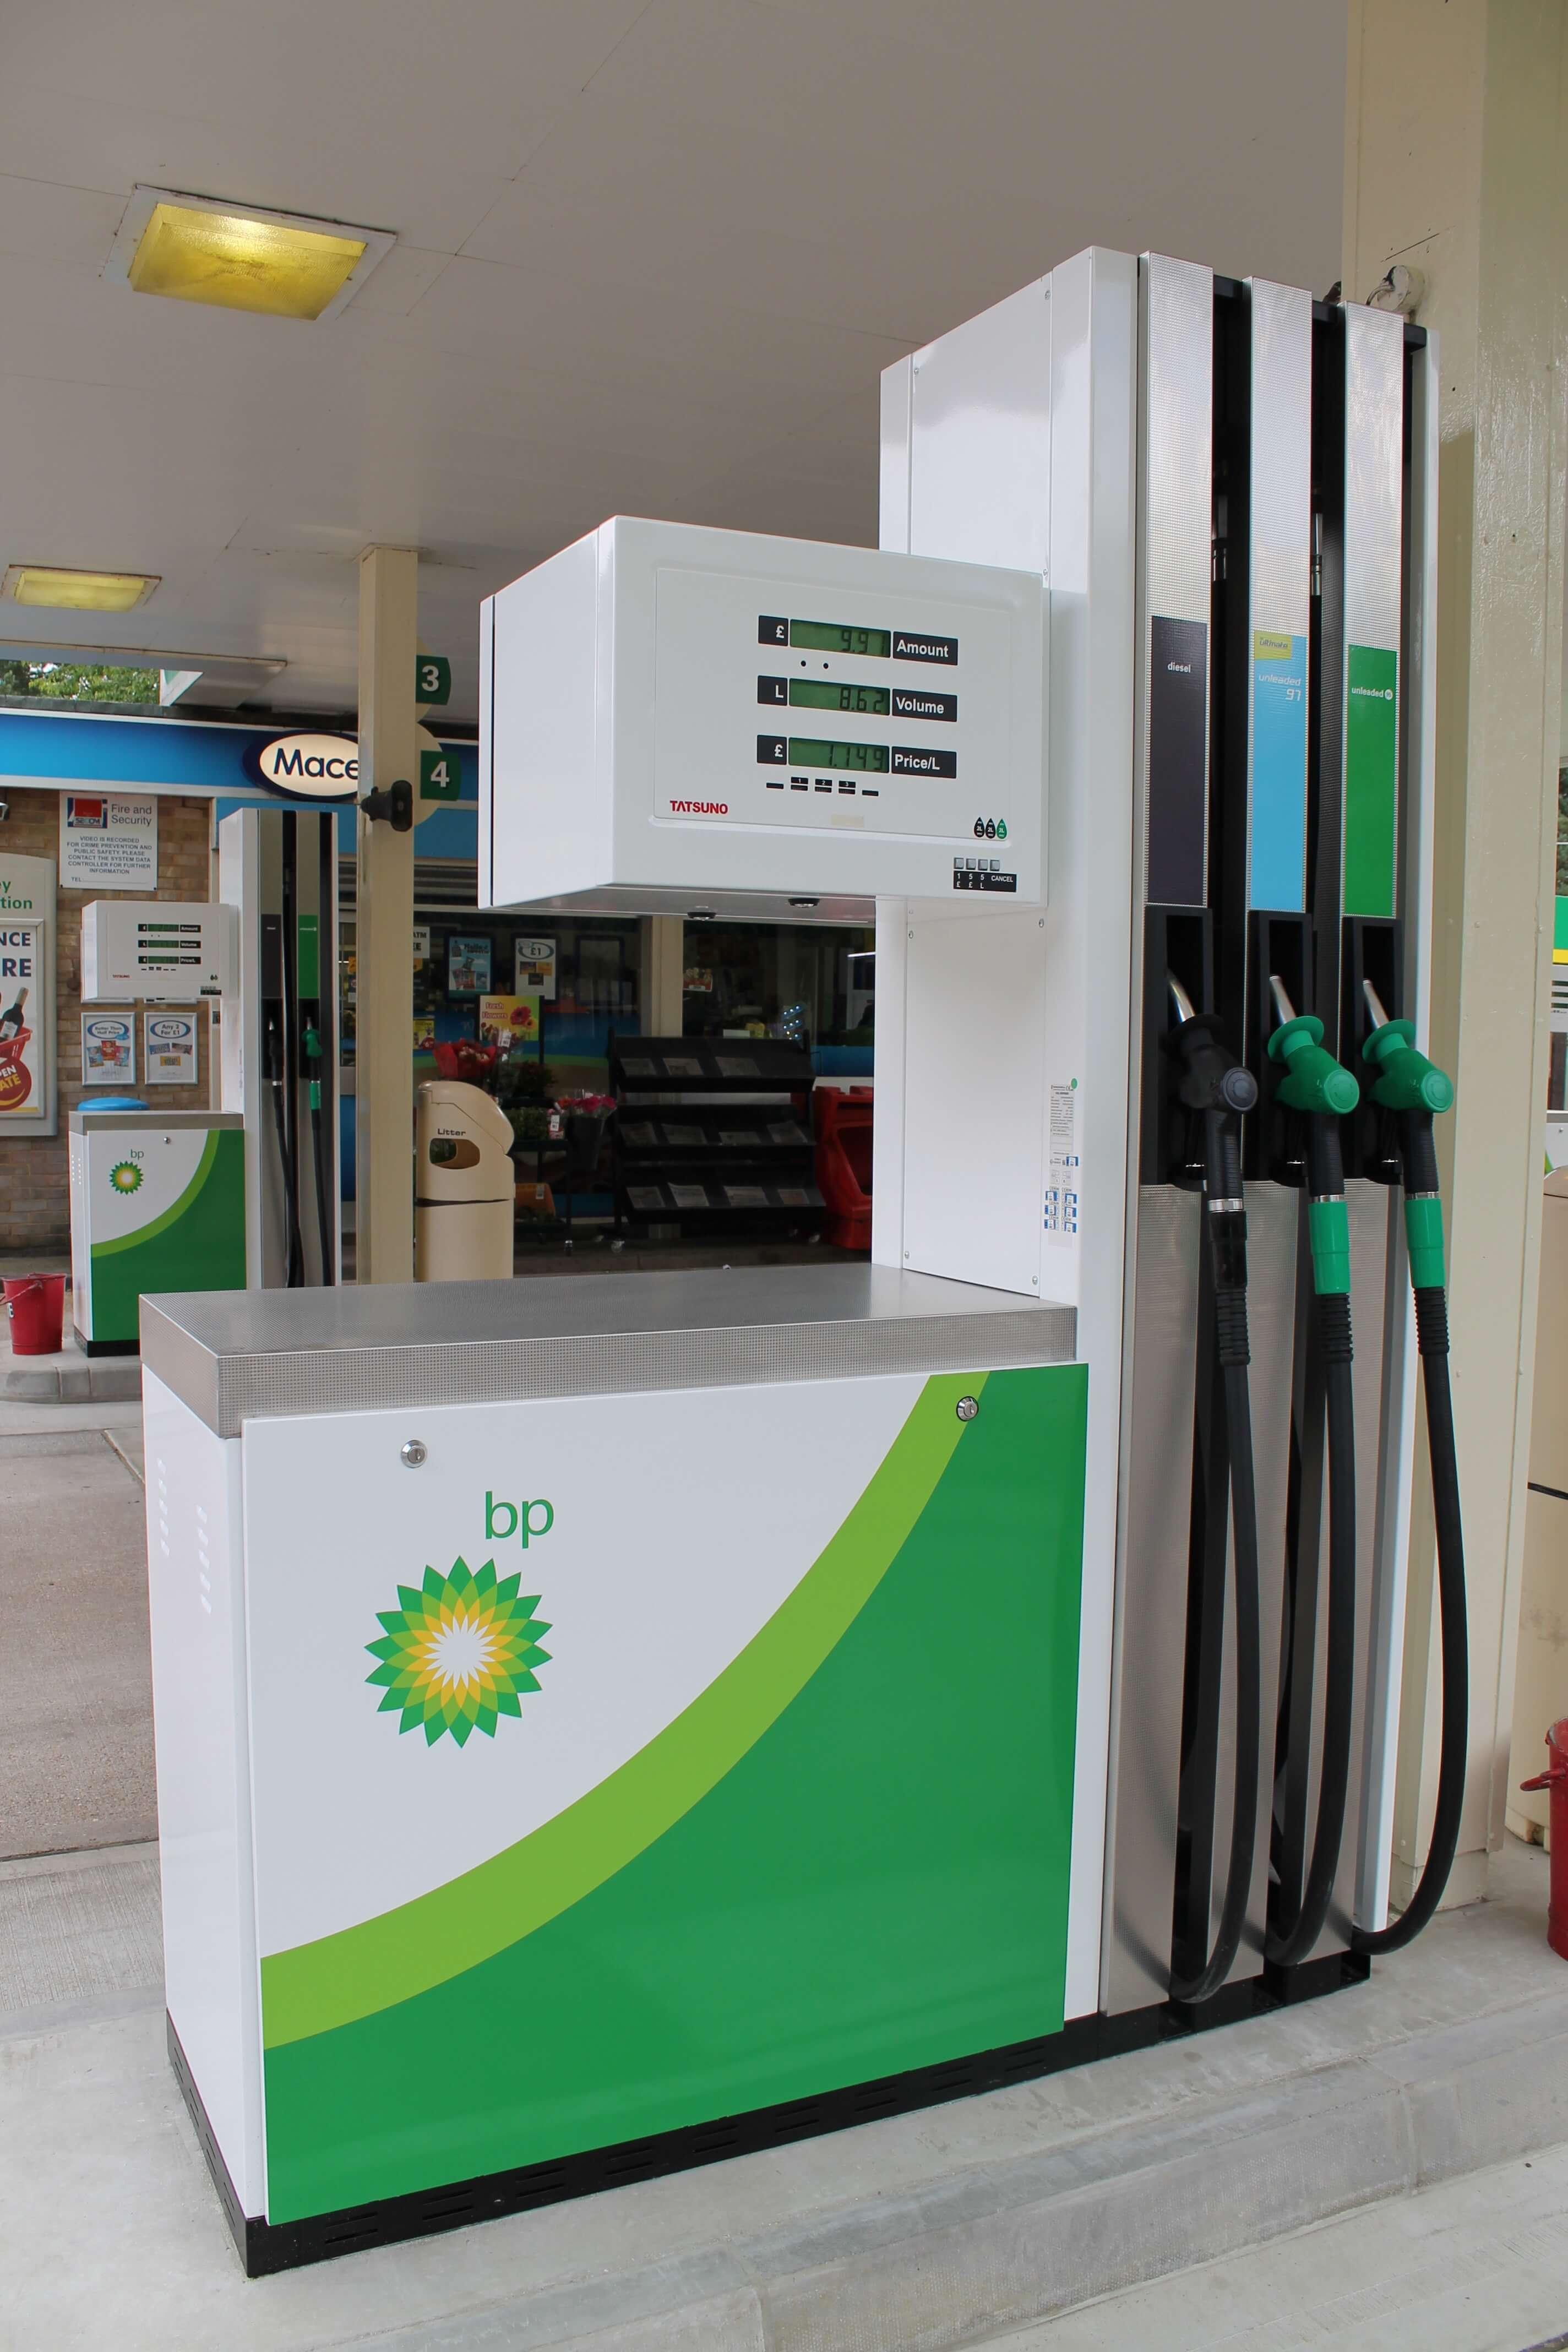 Tatsuno fuel pump